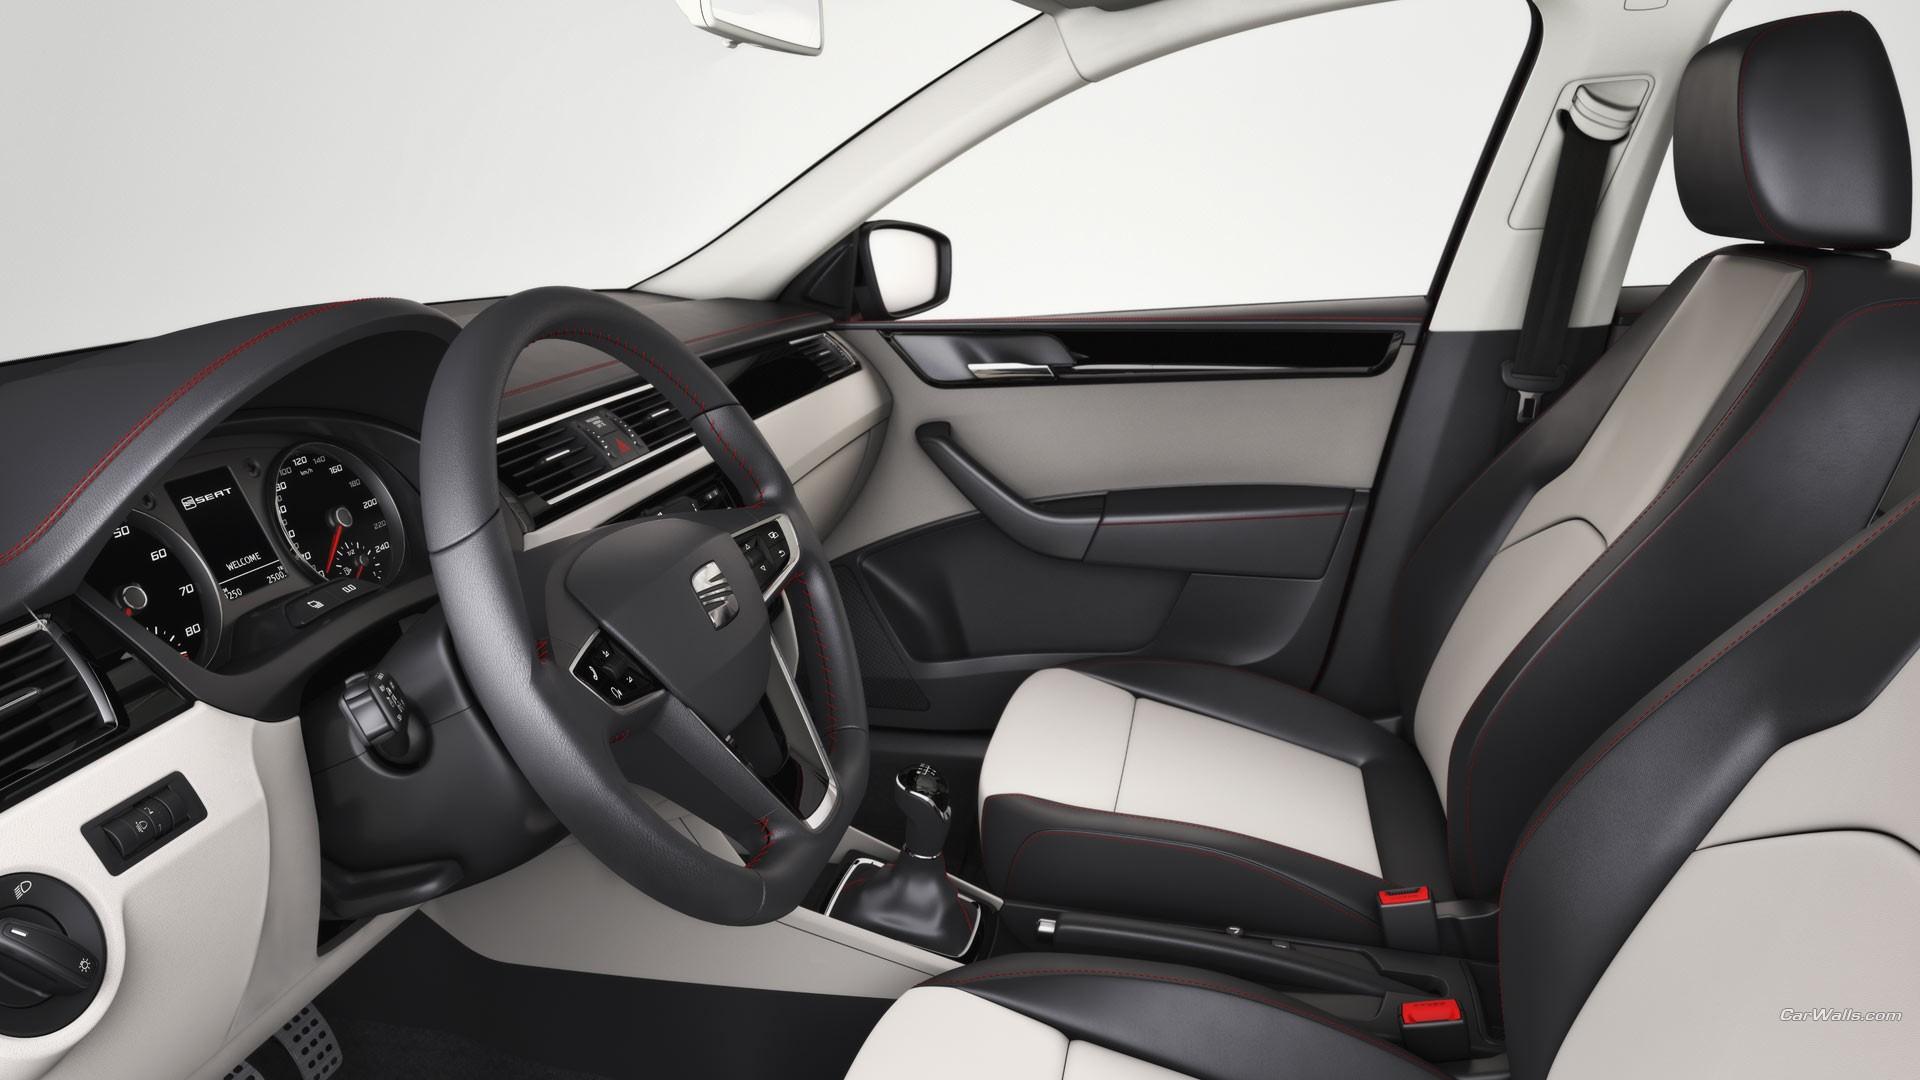 Wallpaper : 1920x1080 px, car interior, Seat Toledo 1920x1080 ...